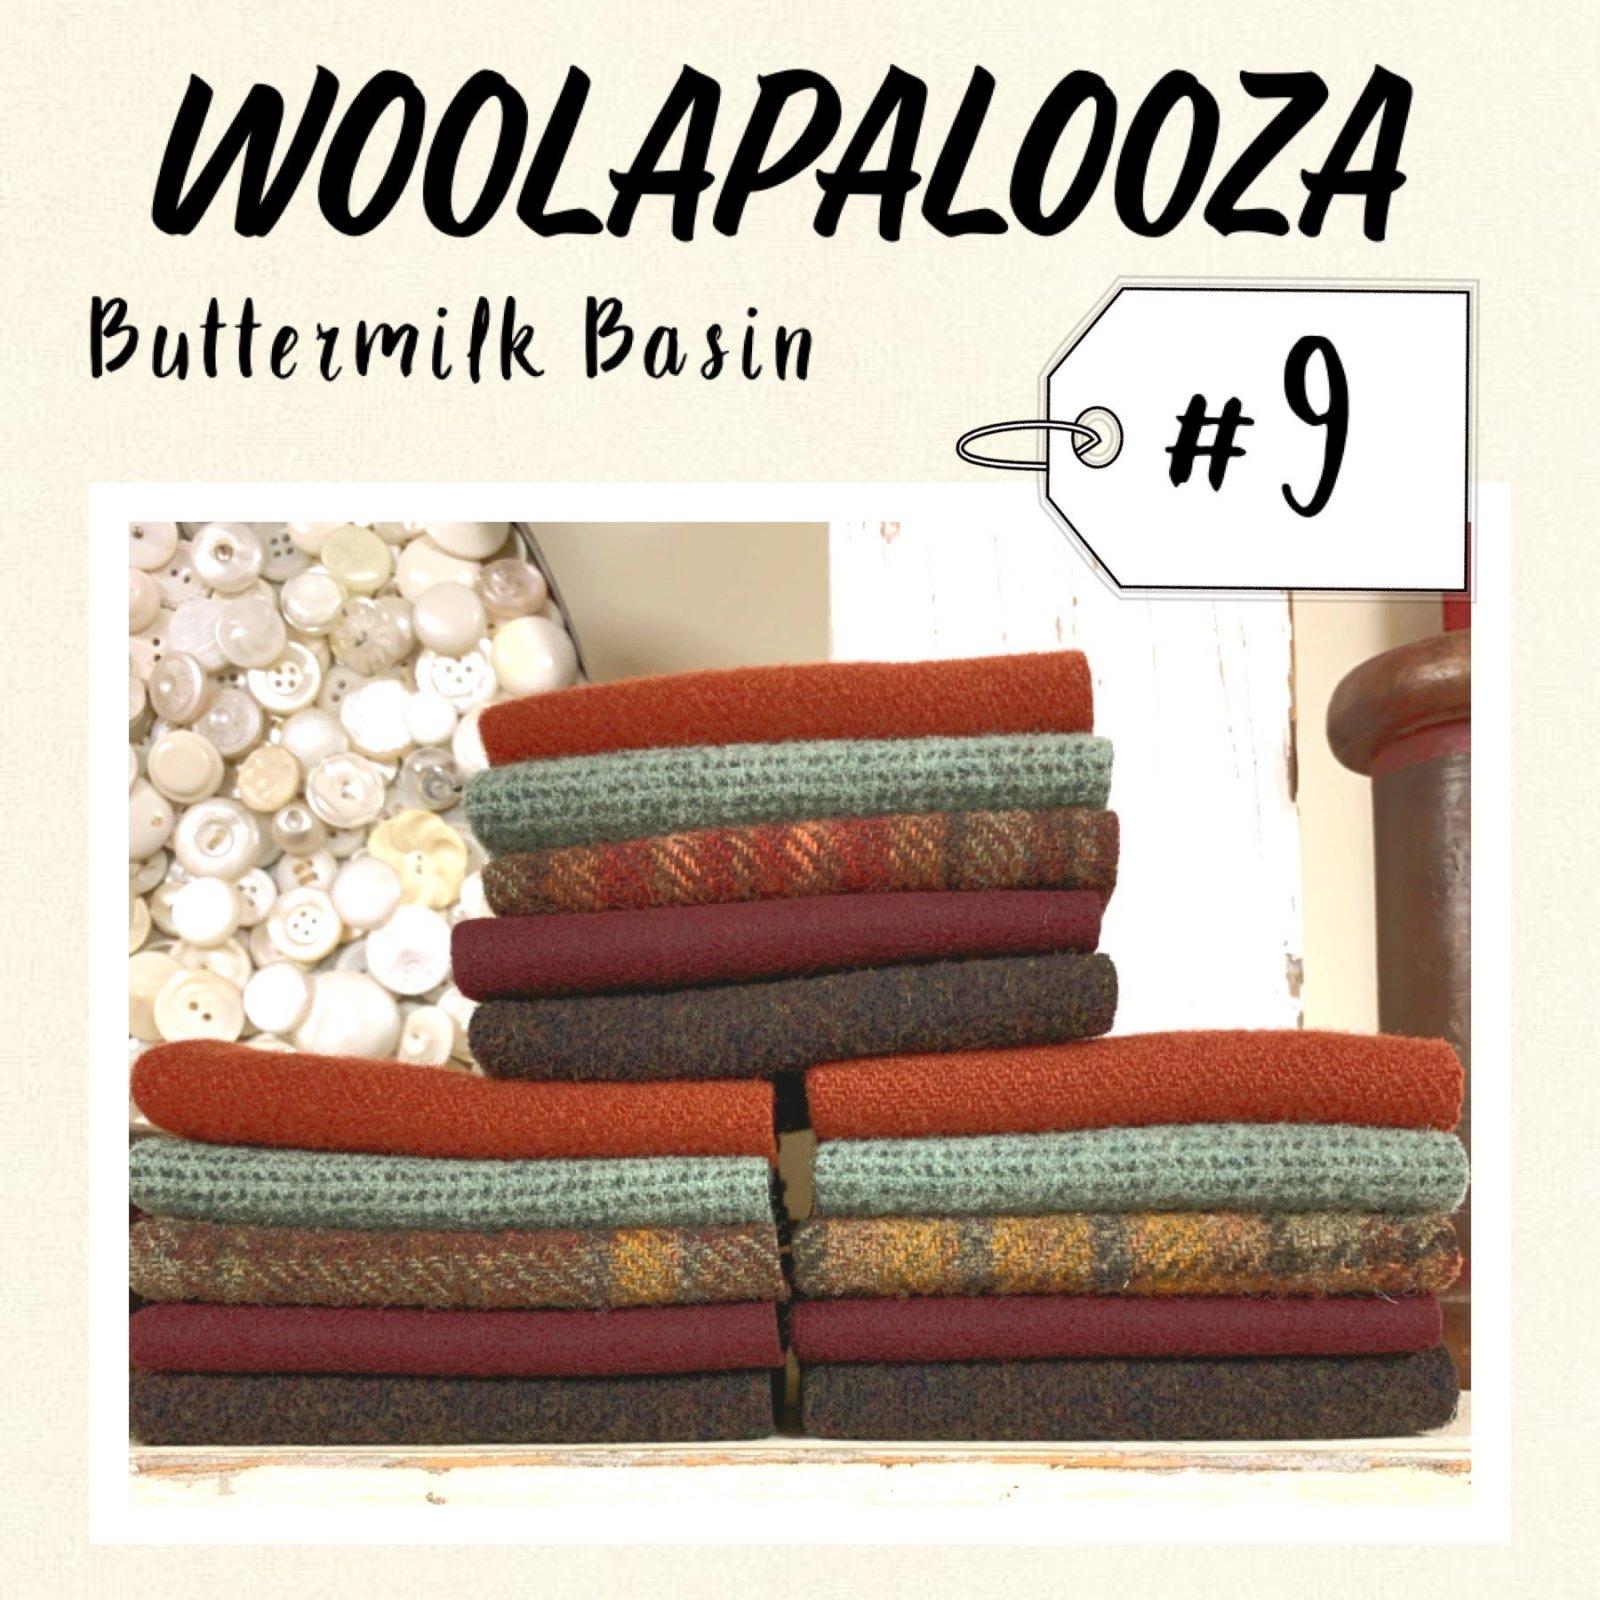 Woolapalooza #9 Wool Bundle